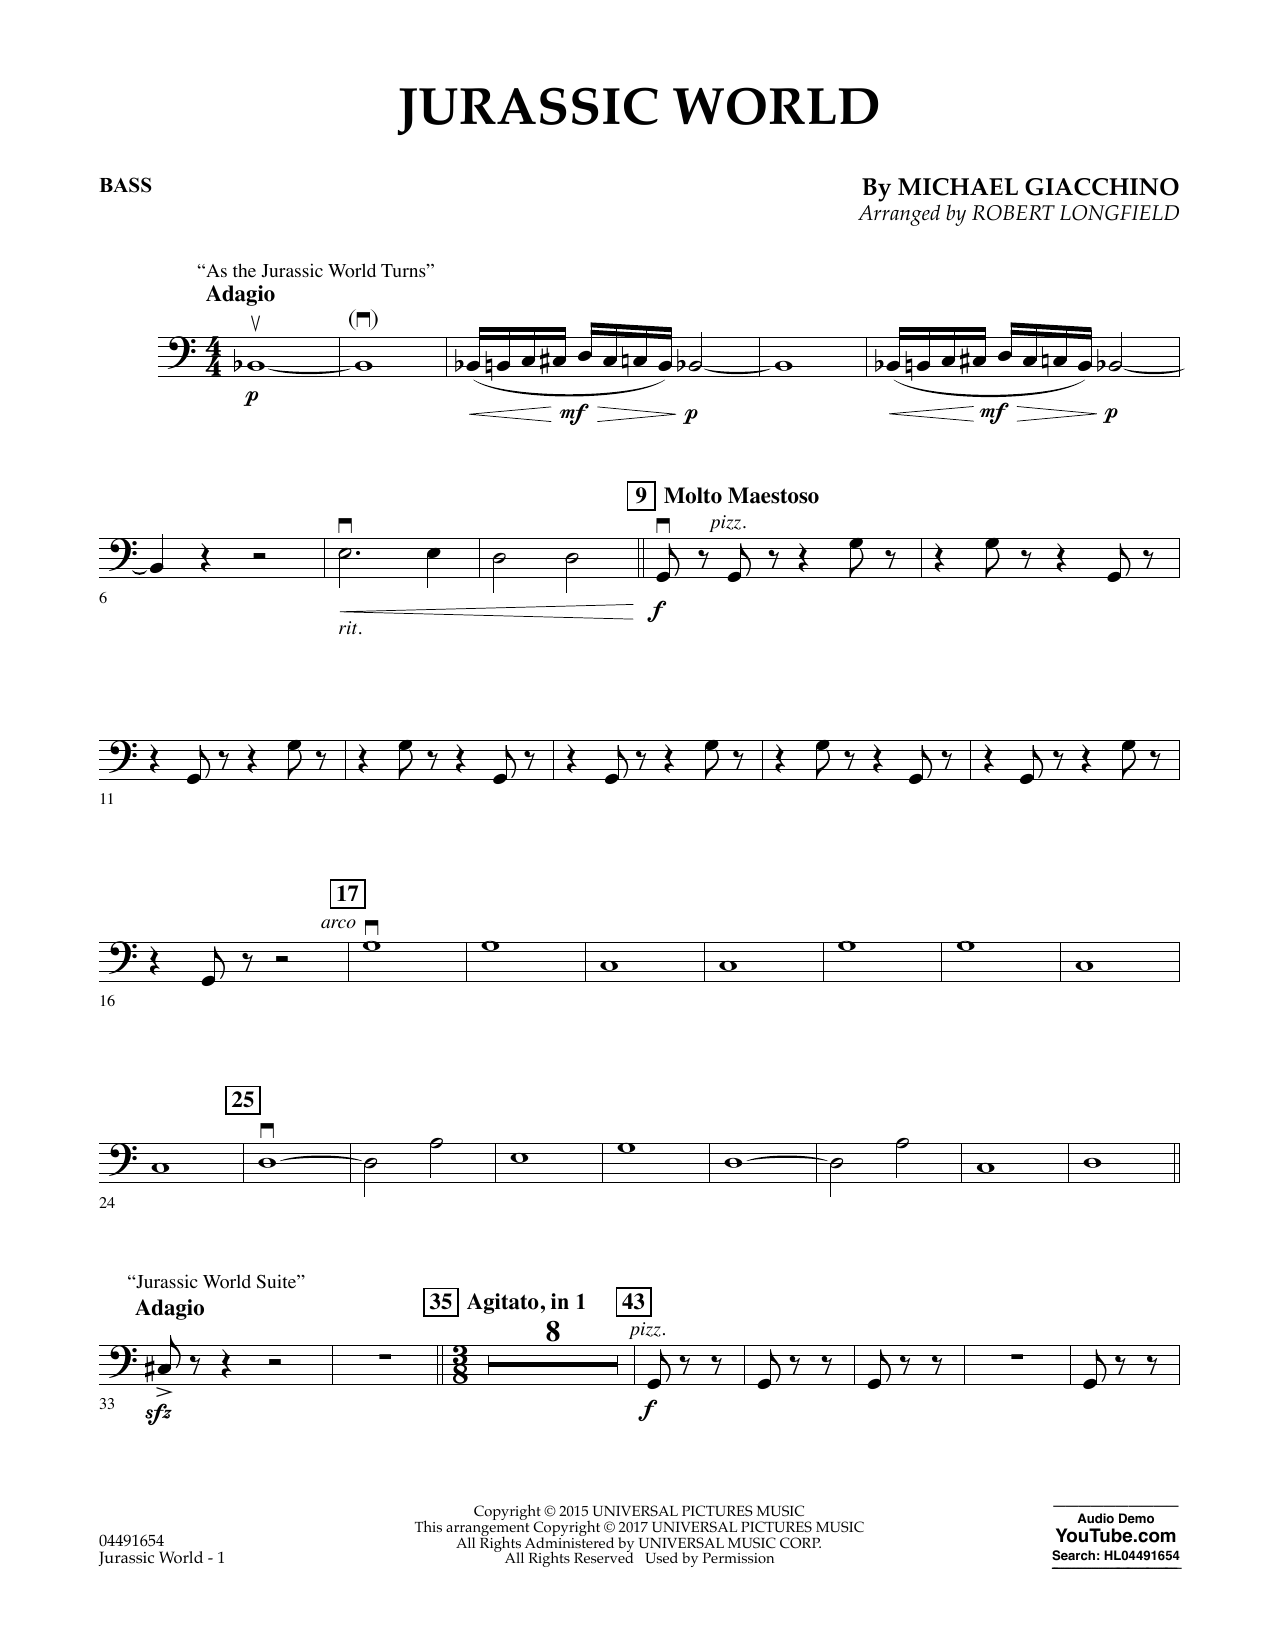 Jurassic World - Bass (Orchestra)